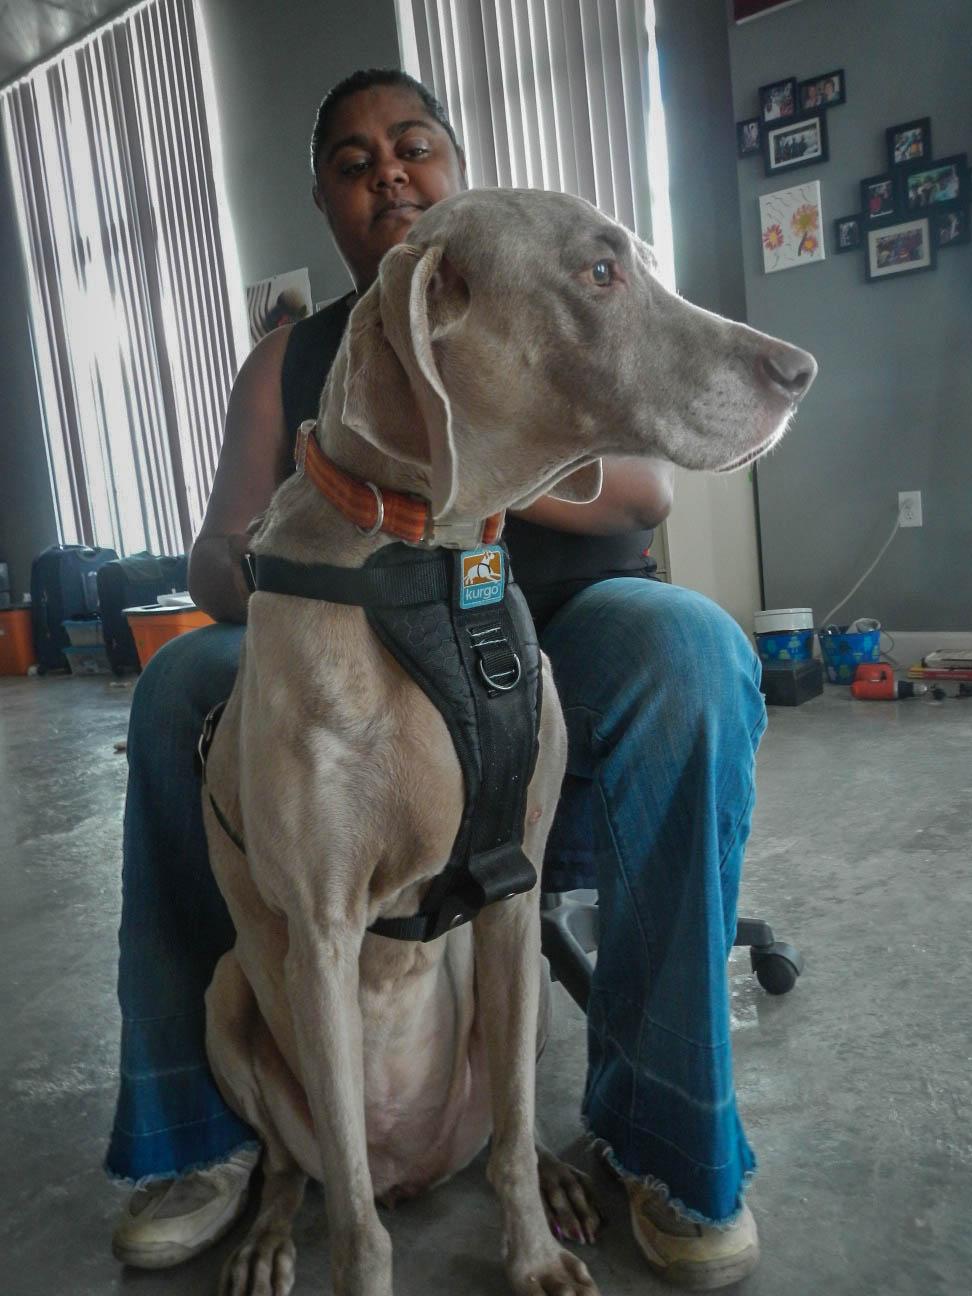 Dog Car Safety Kurgo Auto Harness Zip Line Review